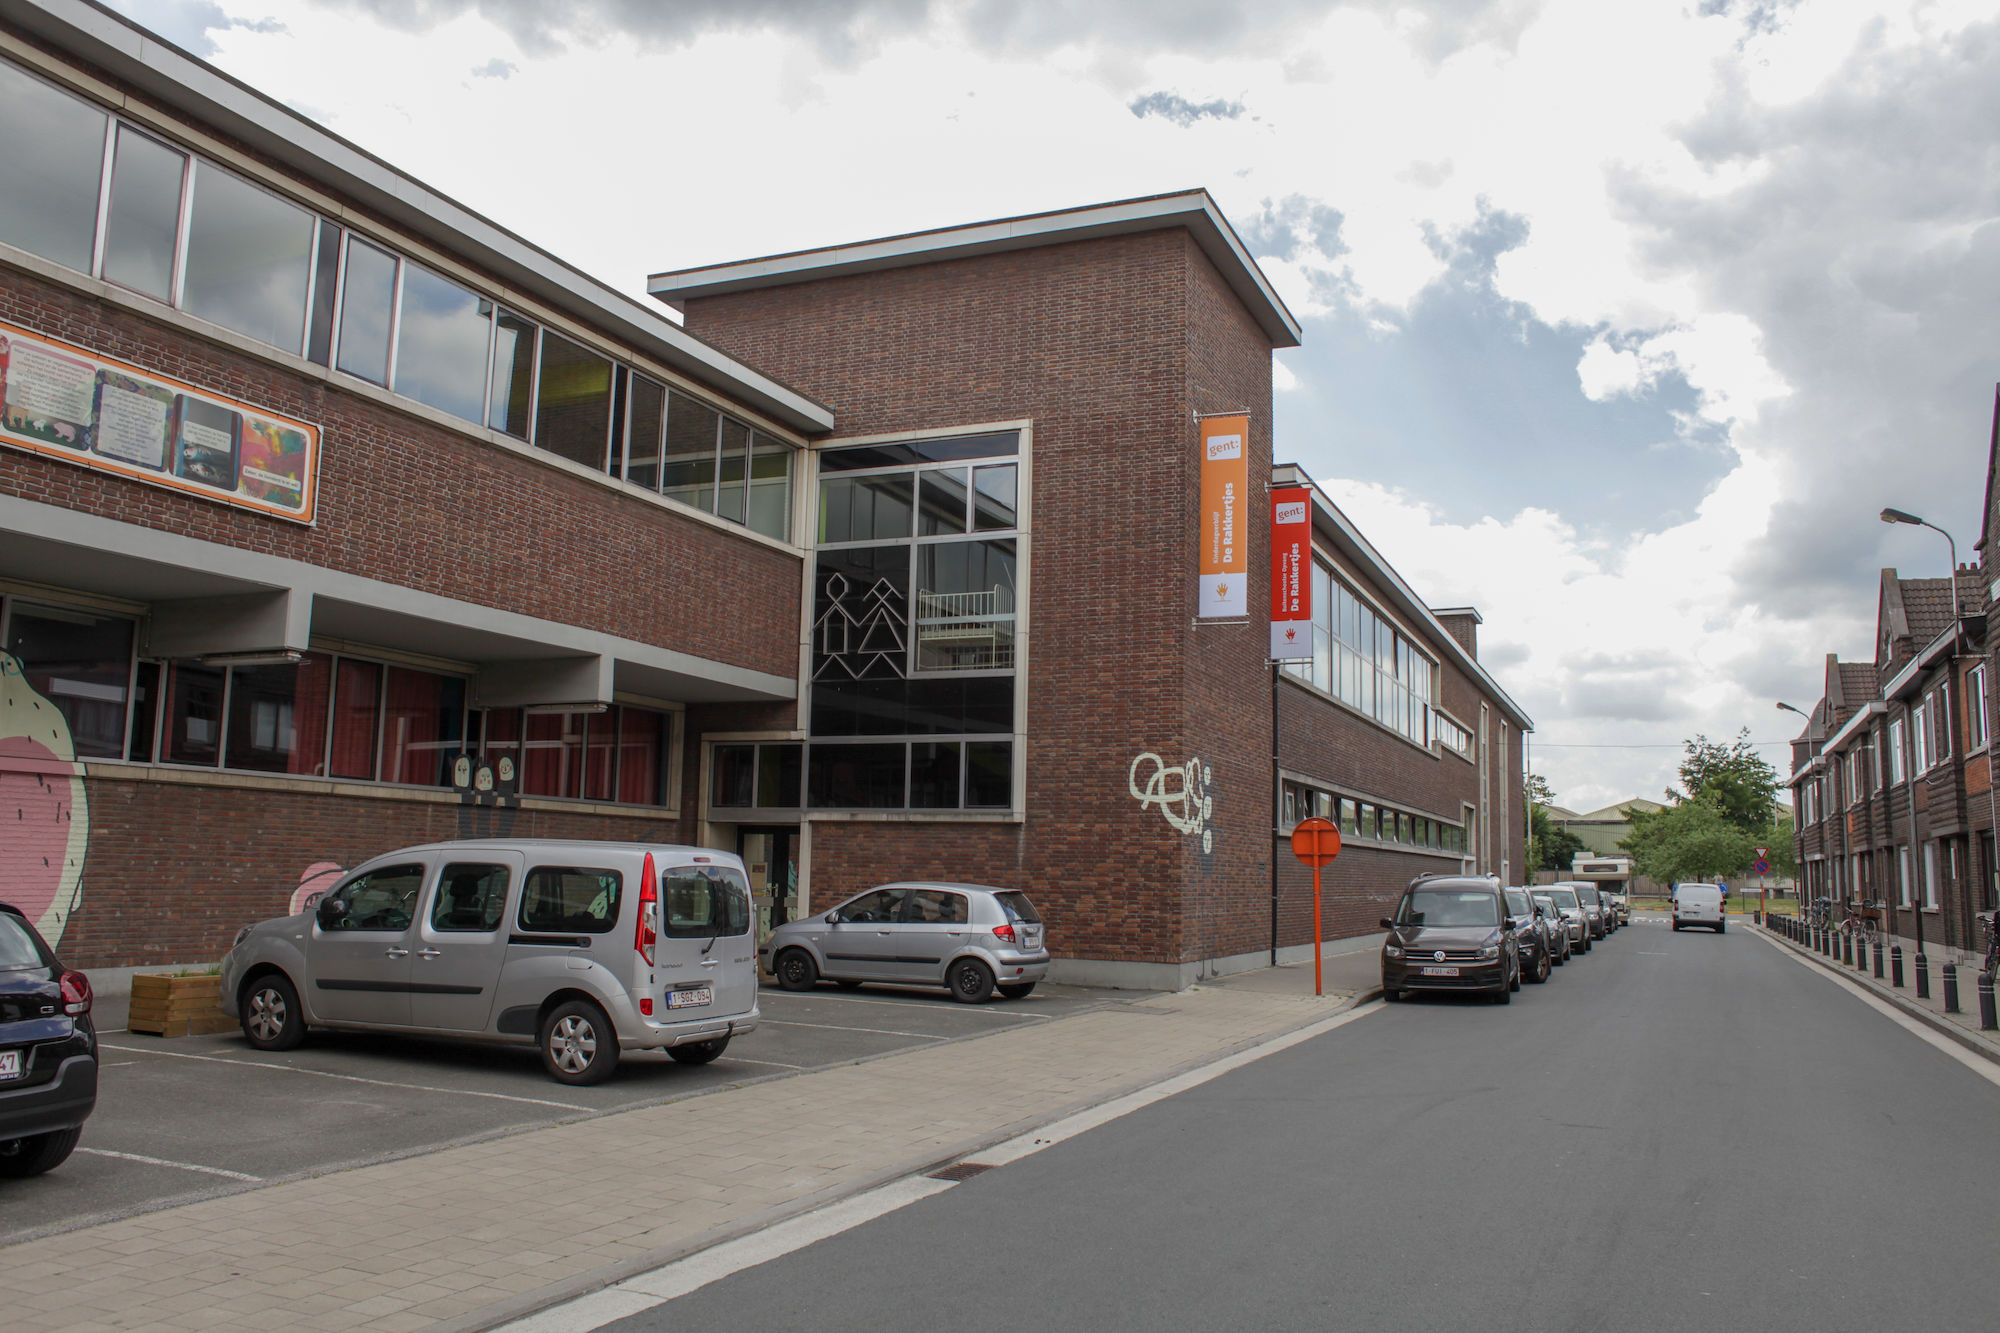 2019-07-02 Muide Meulestede prospectie Wannes_stadsvernieuwing_IMG_0328-2.jpg